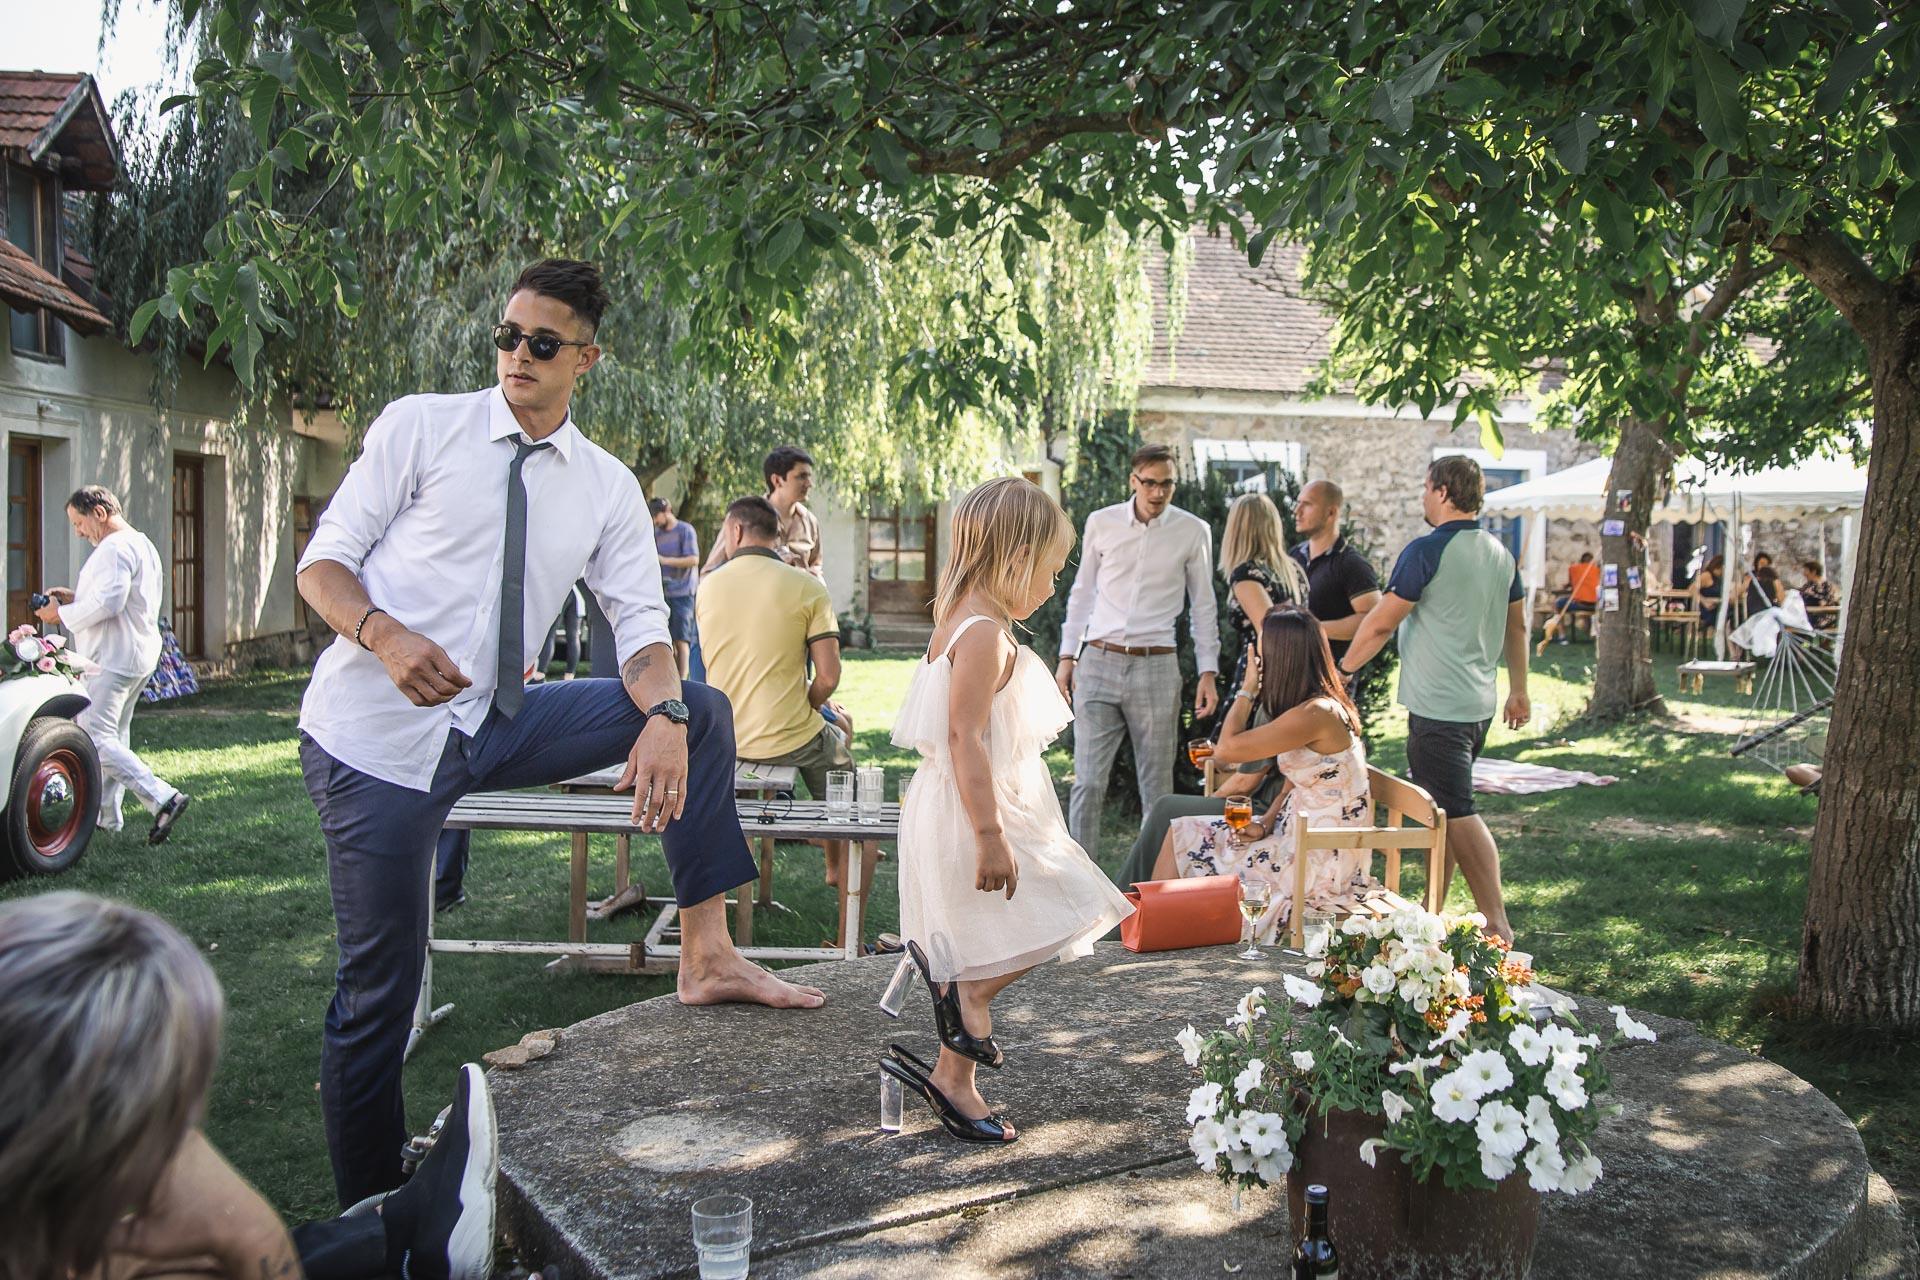 svatební-fotograf-wedding-svatebni-video-orlík-vltava-kostel-statek-stodola-boho-svatba-Beautyfoto-435